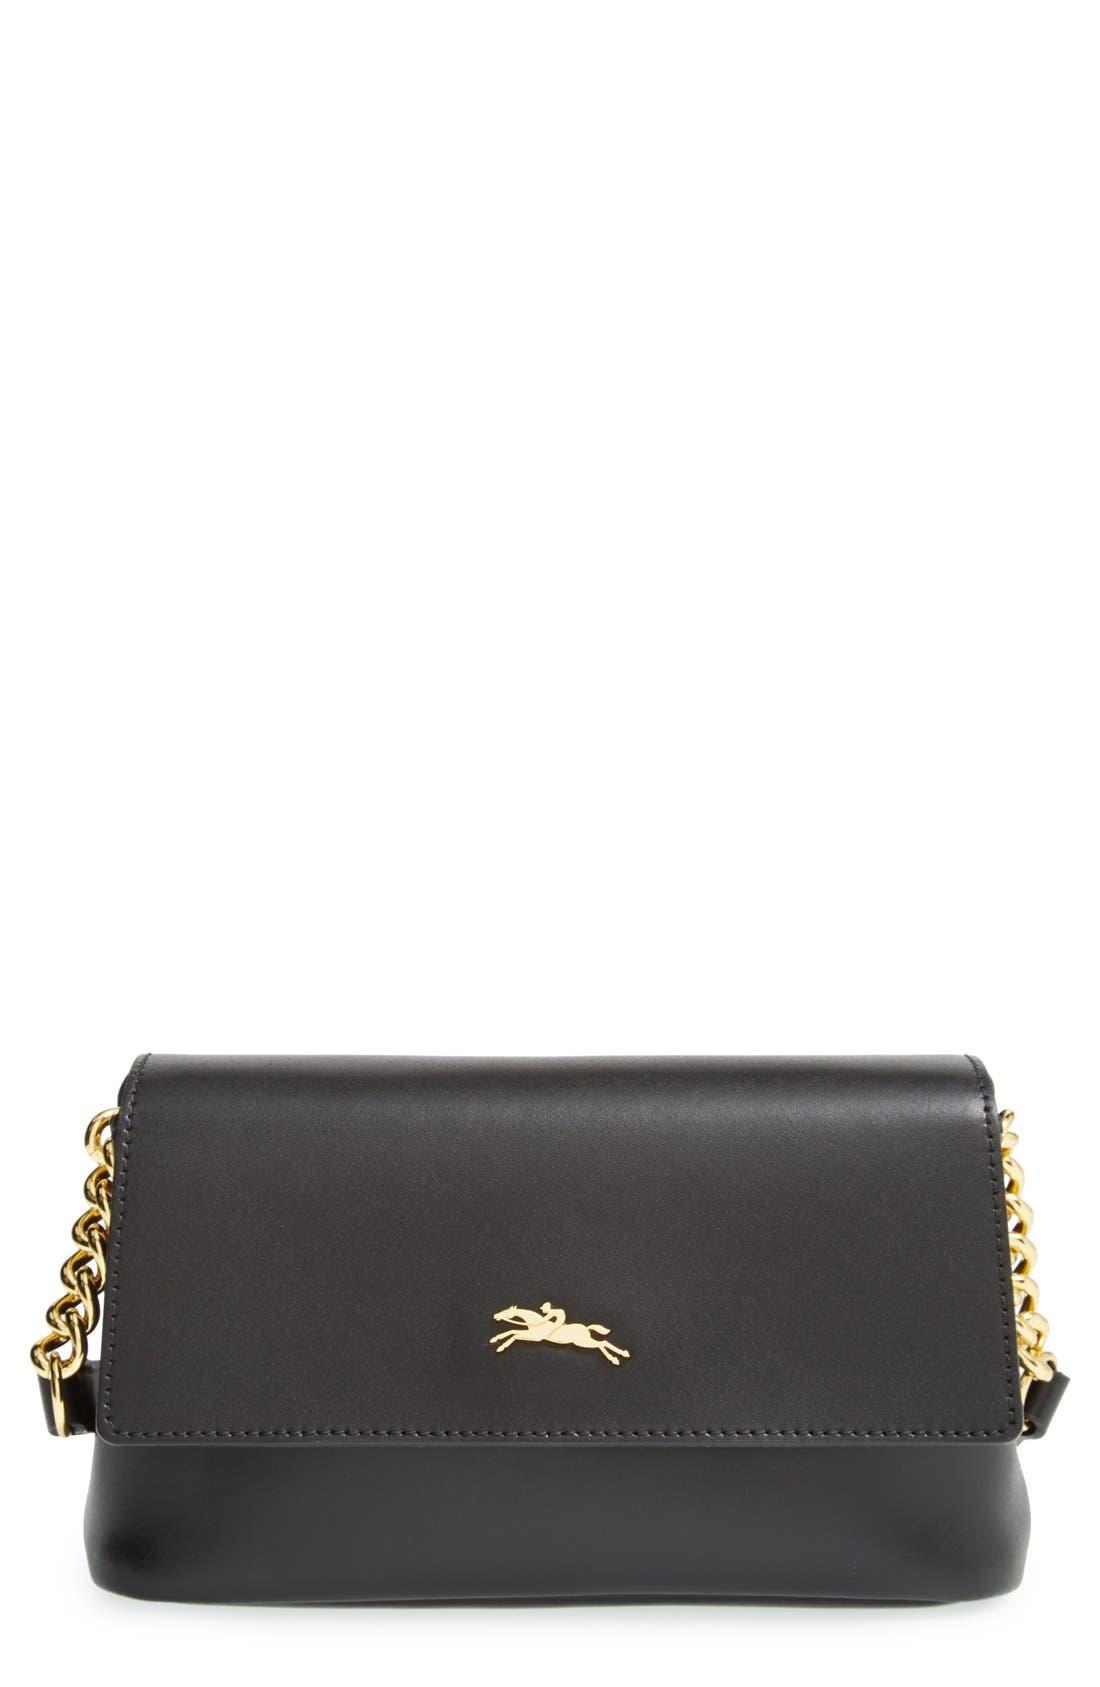 Longchamp 'Honore' Crossbody Bag